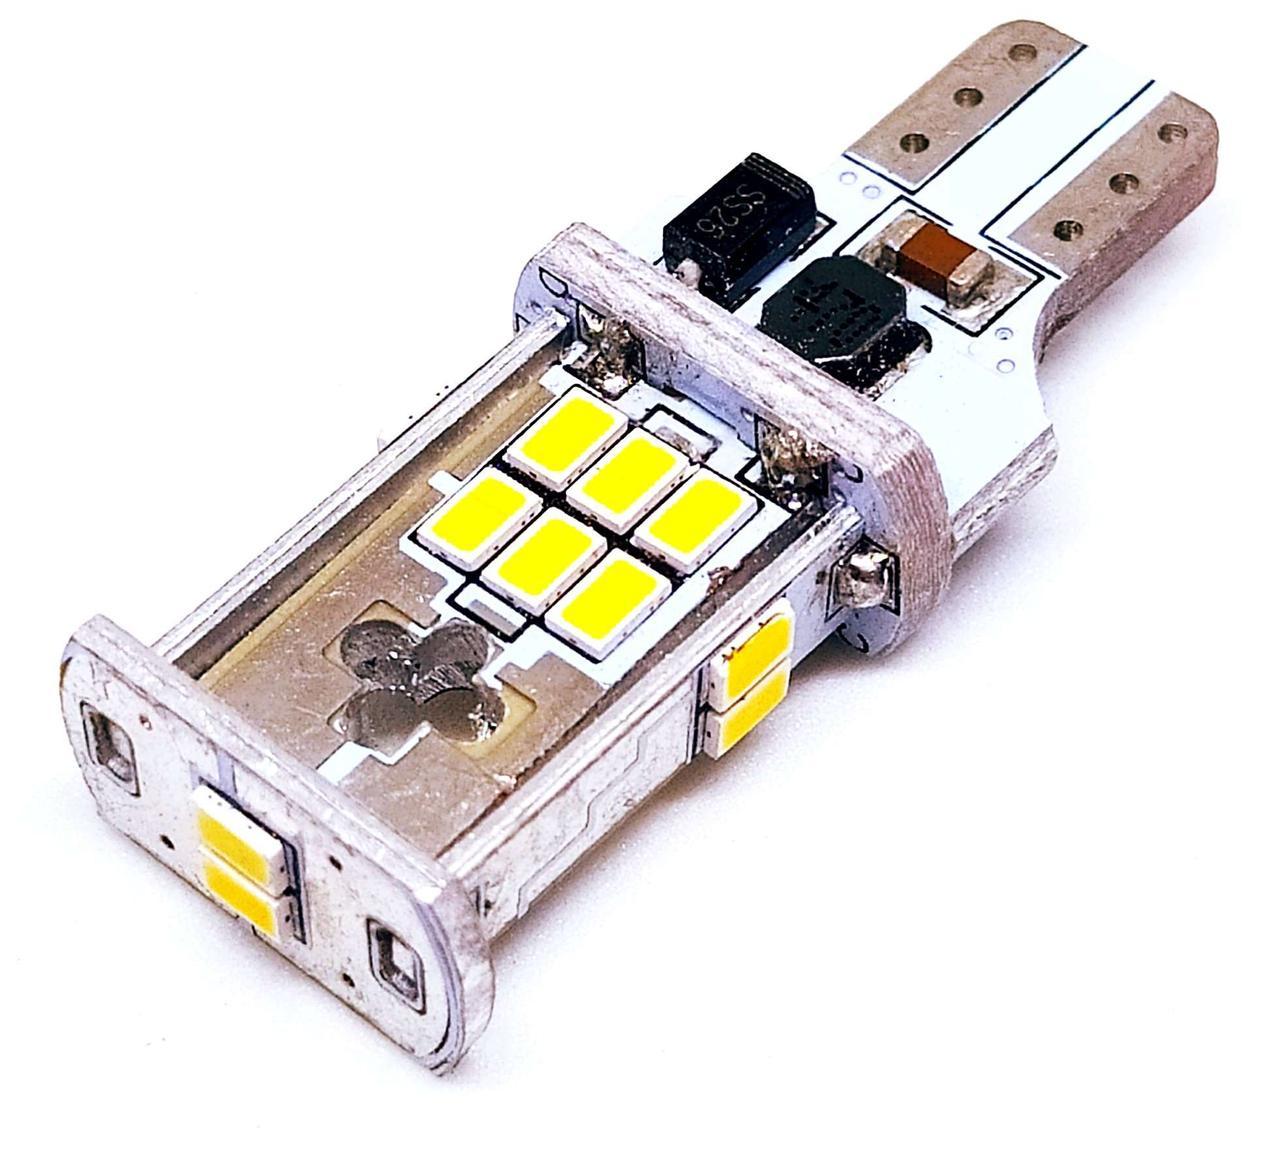 LED автолампа лед диодная T15 W16W, SMD 2030, 12В, 16Вт, Canbus, Белый